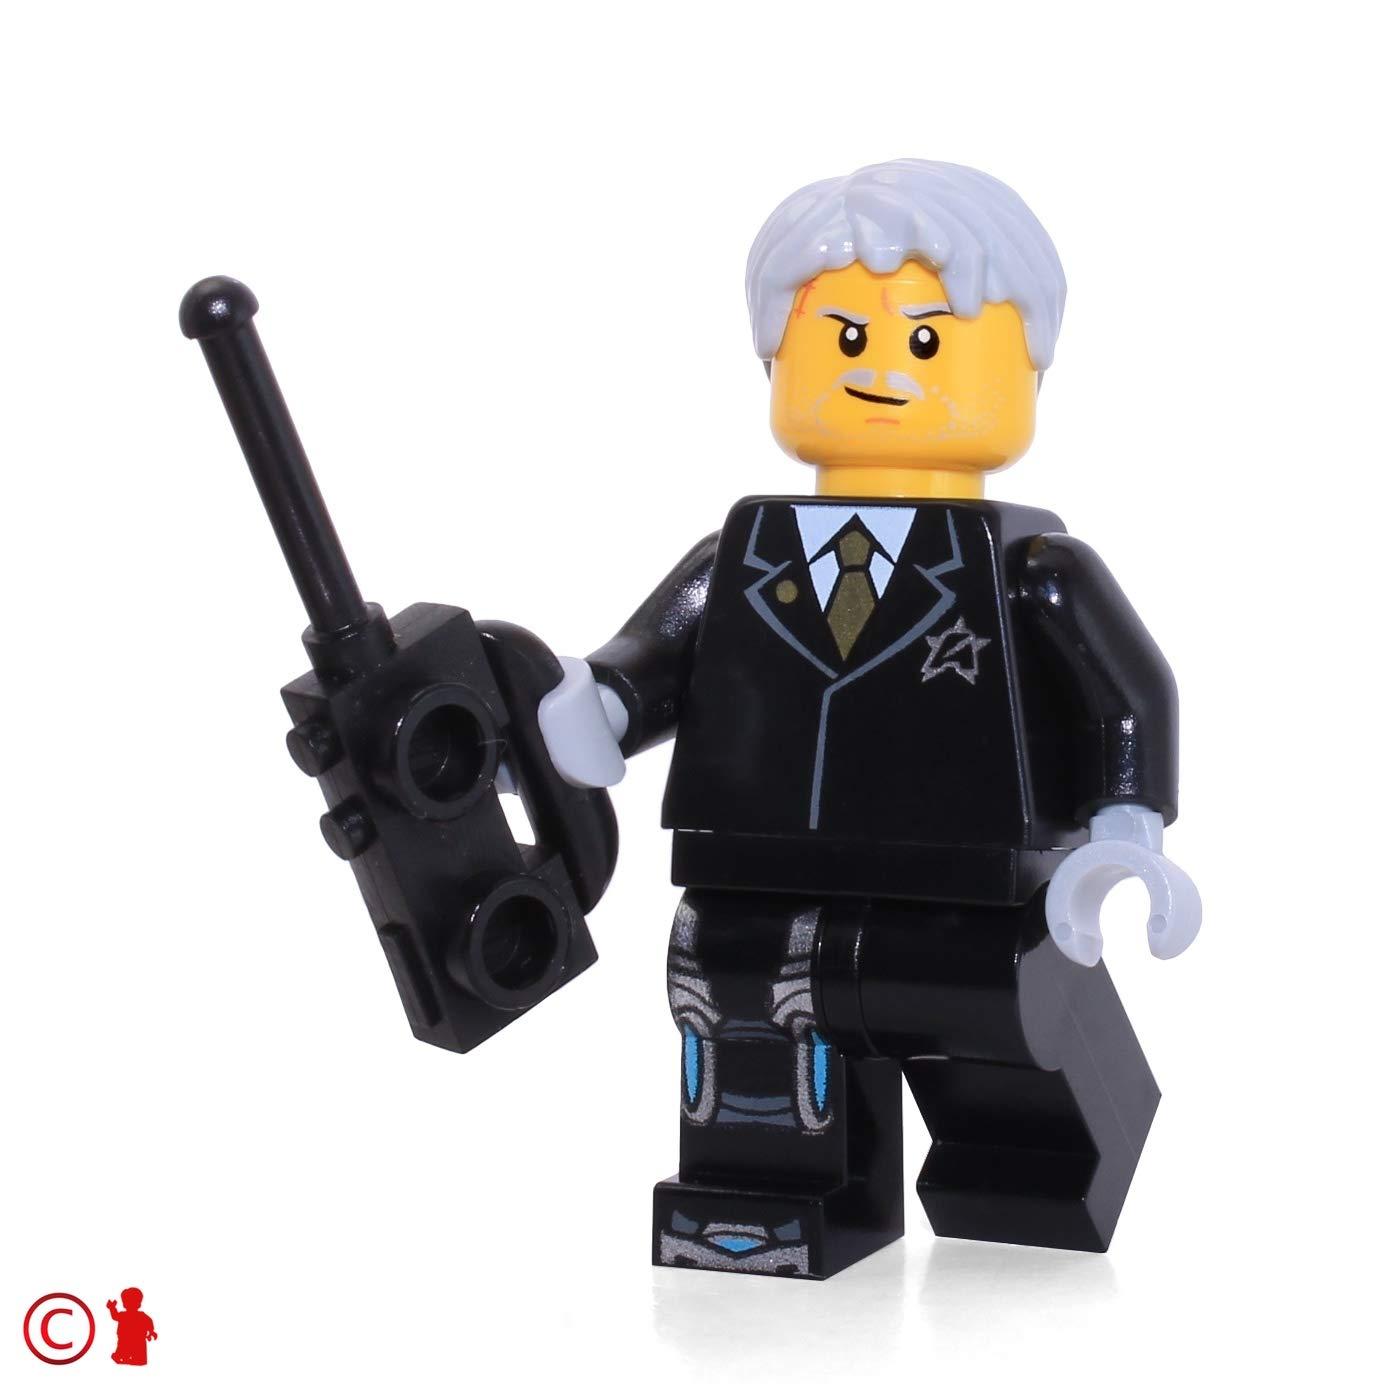 LEGO Ultra Agents Solomon Blaze Minifigure from Set 70170